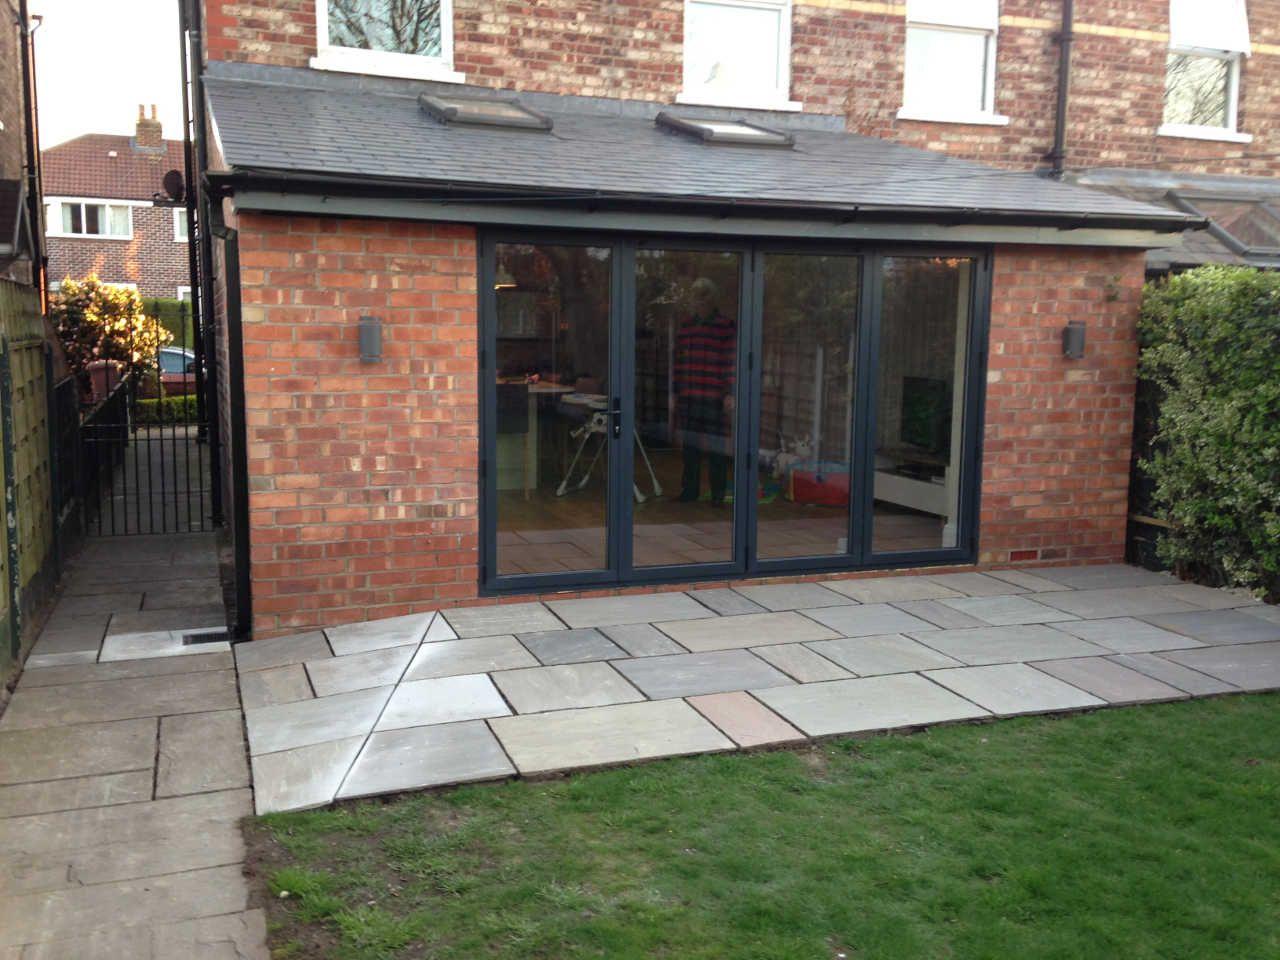 Single storey rear kitchen extension | House extension design